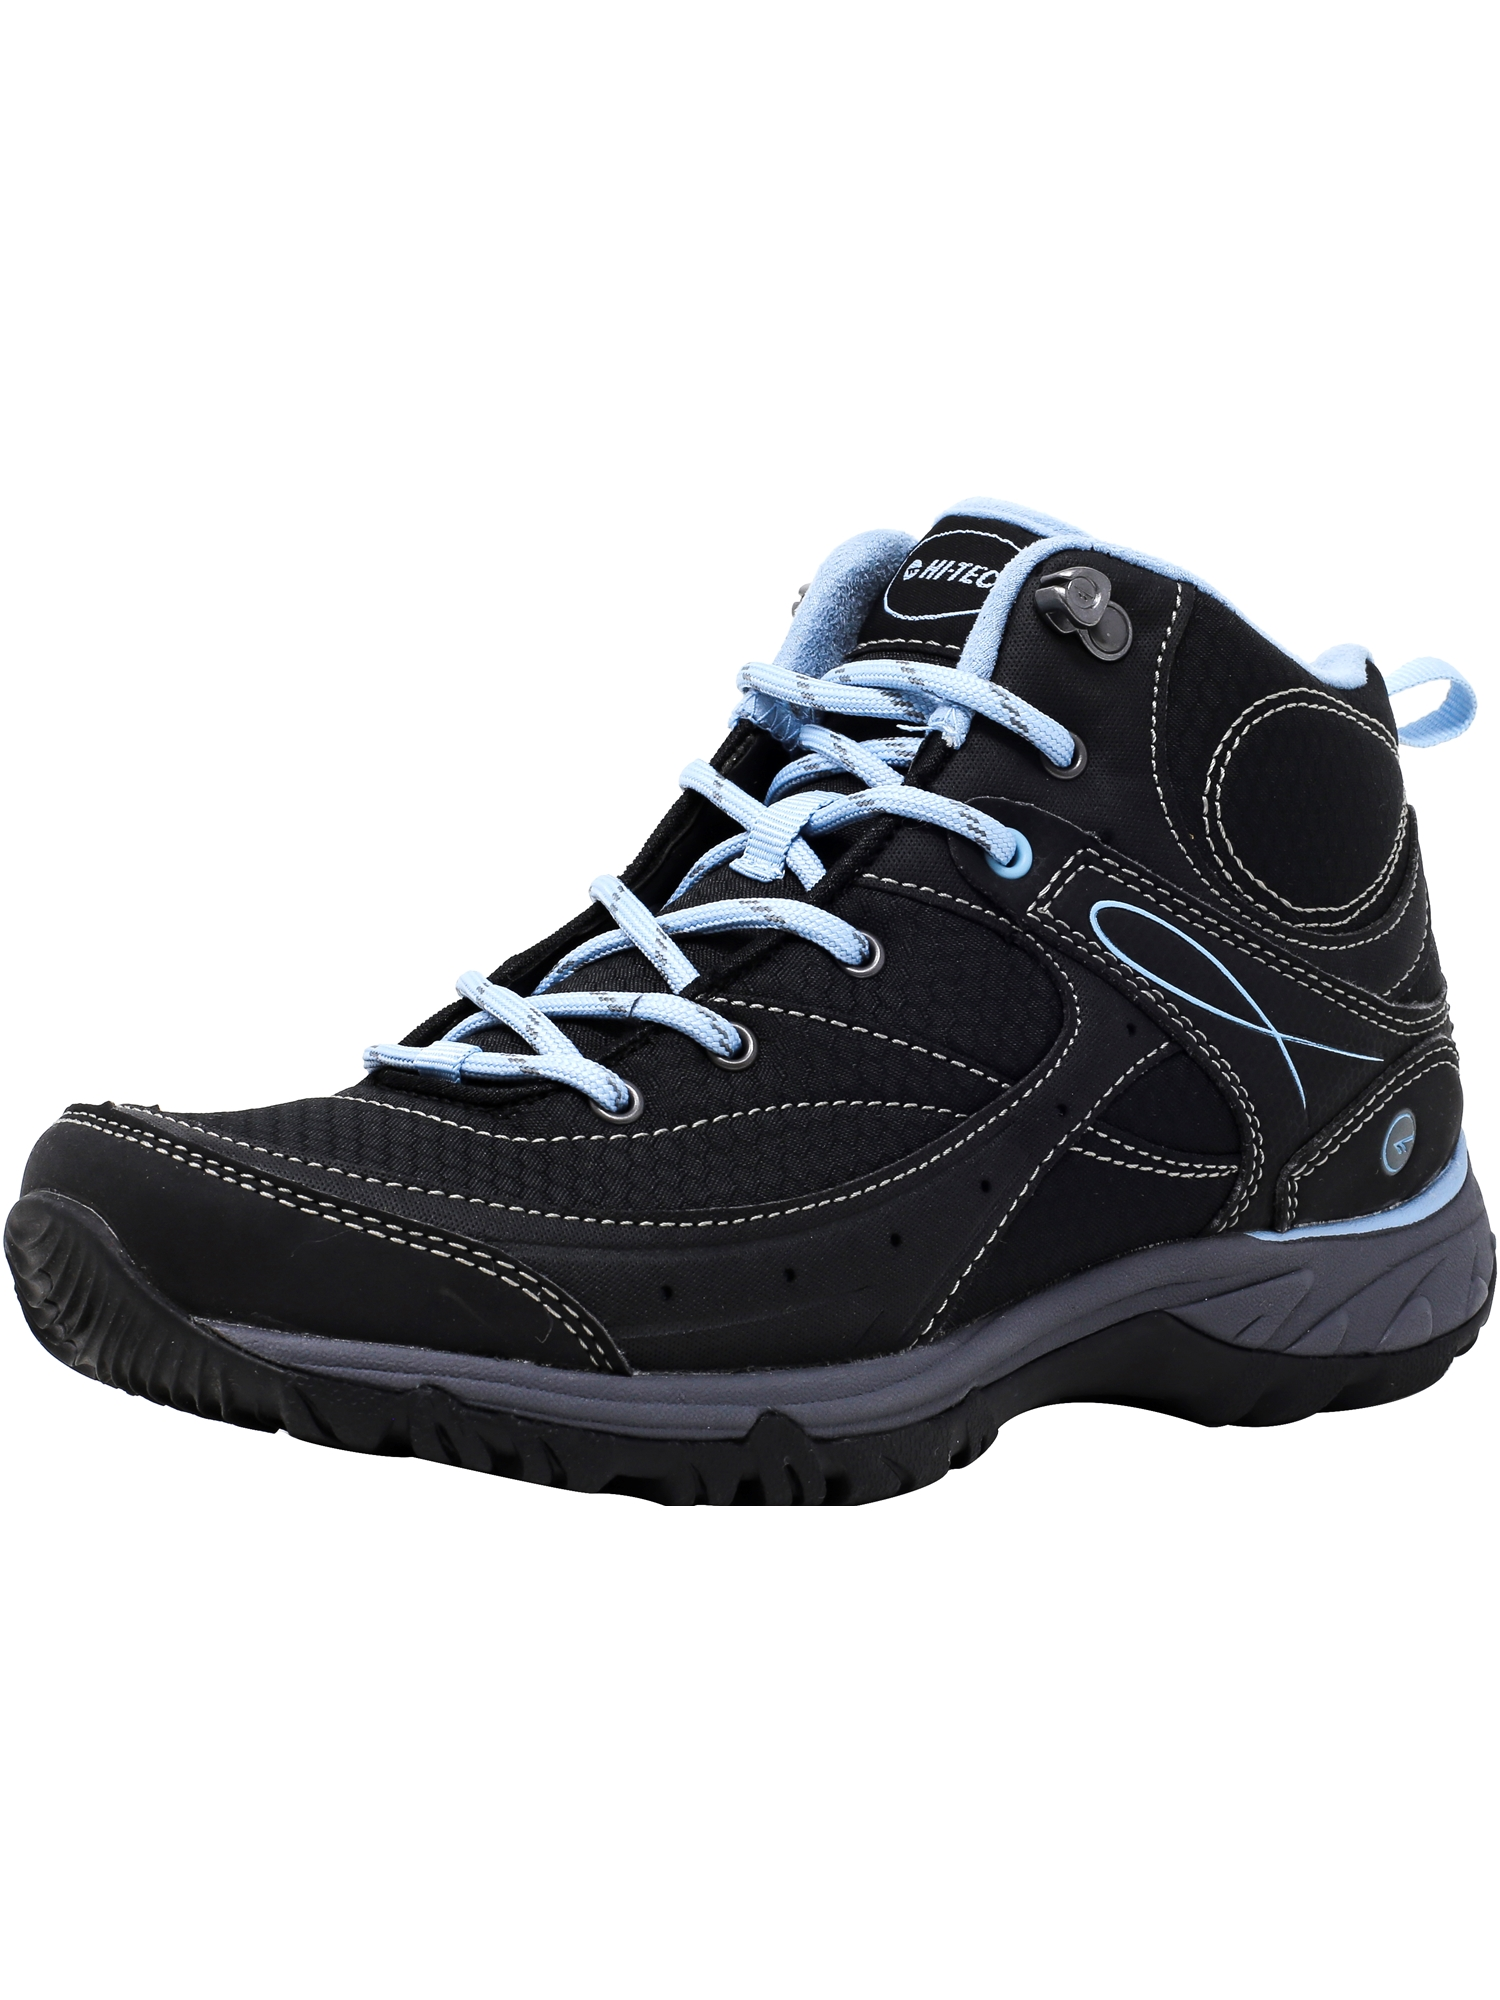 Hi-Tec Women/'s Equilibrio Bijou Mid I Ankle-High Hiking Shoe